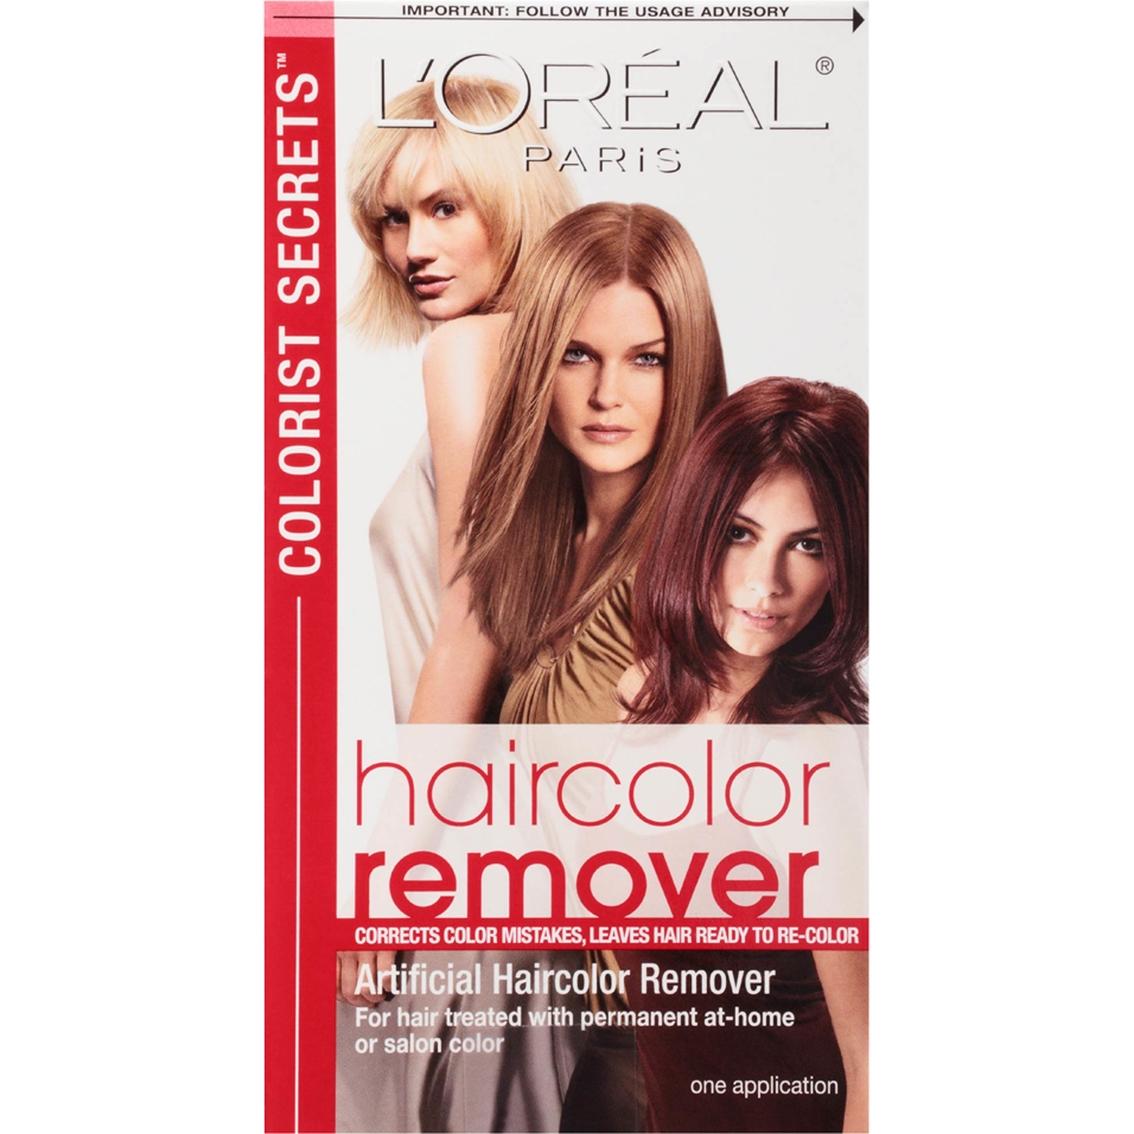 Loreal Colorist Secrets Hair Color Remover Hair Treatments